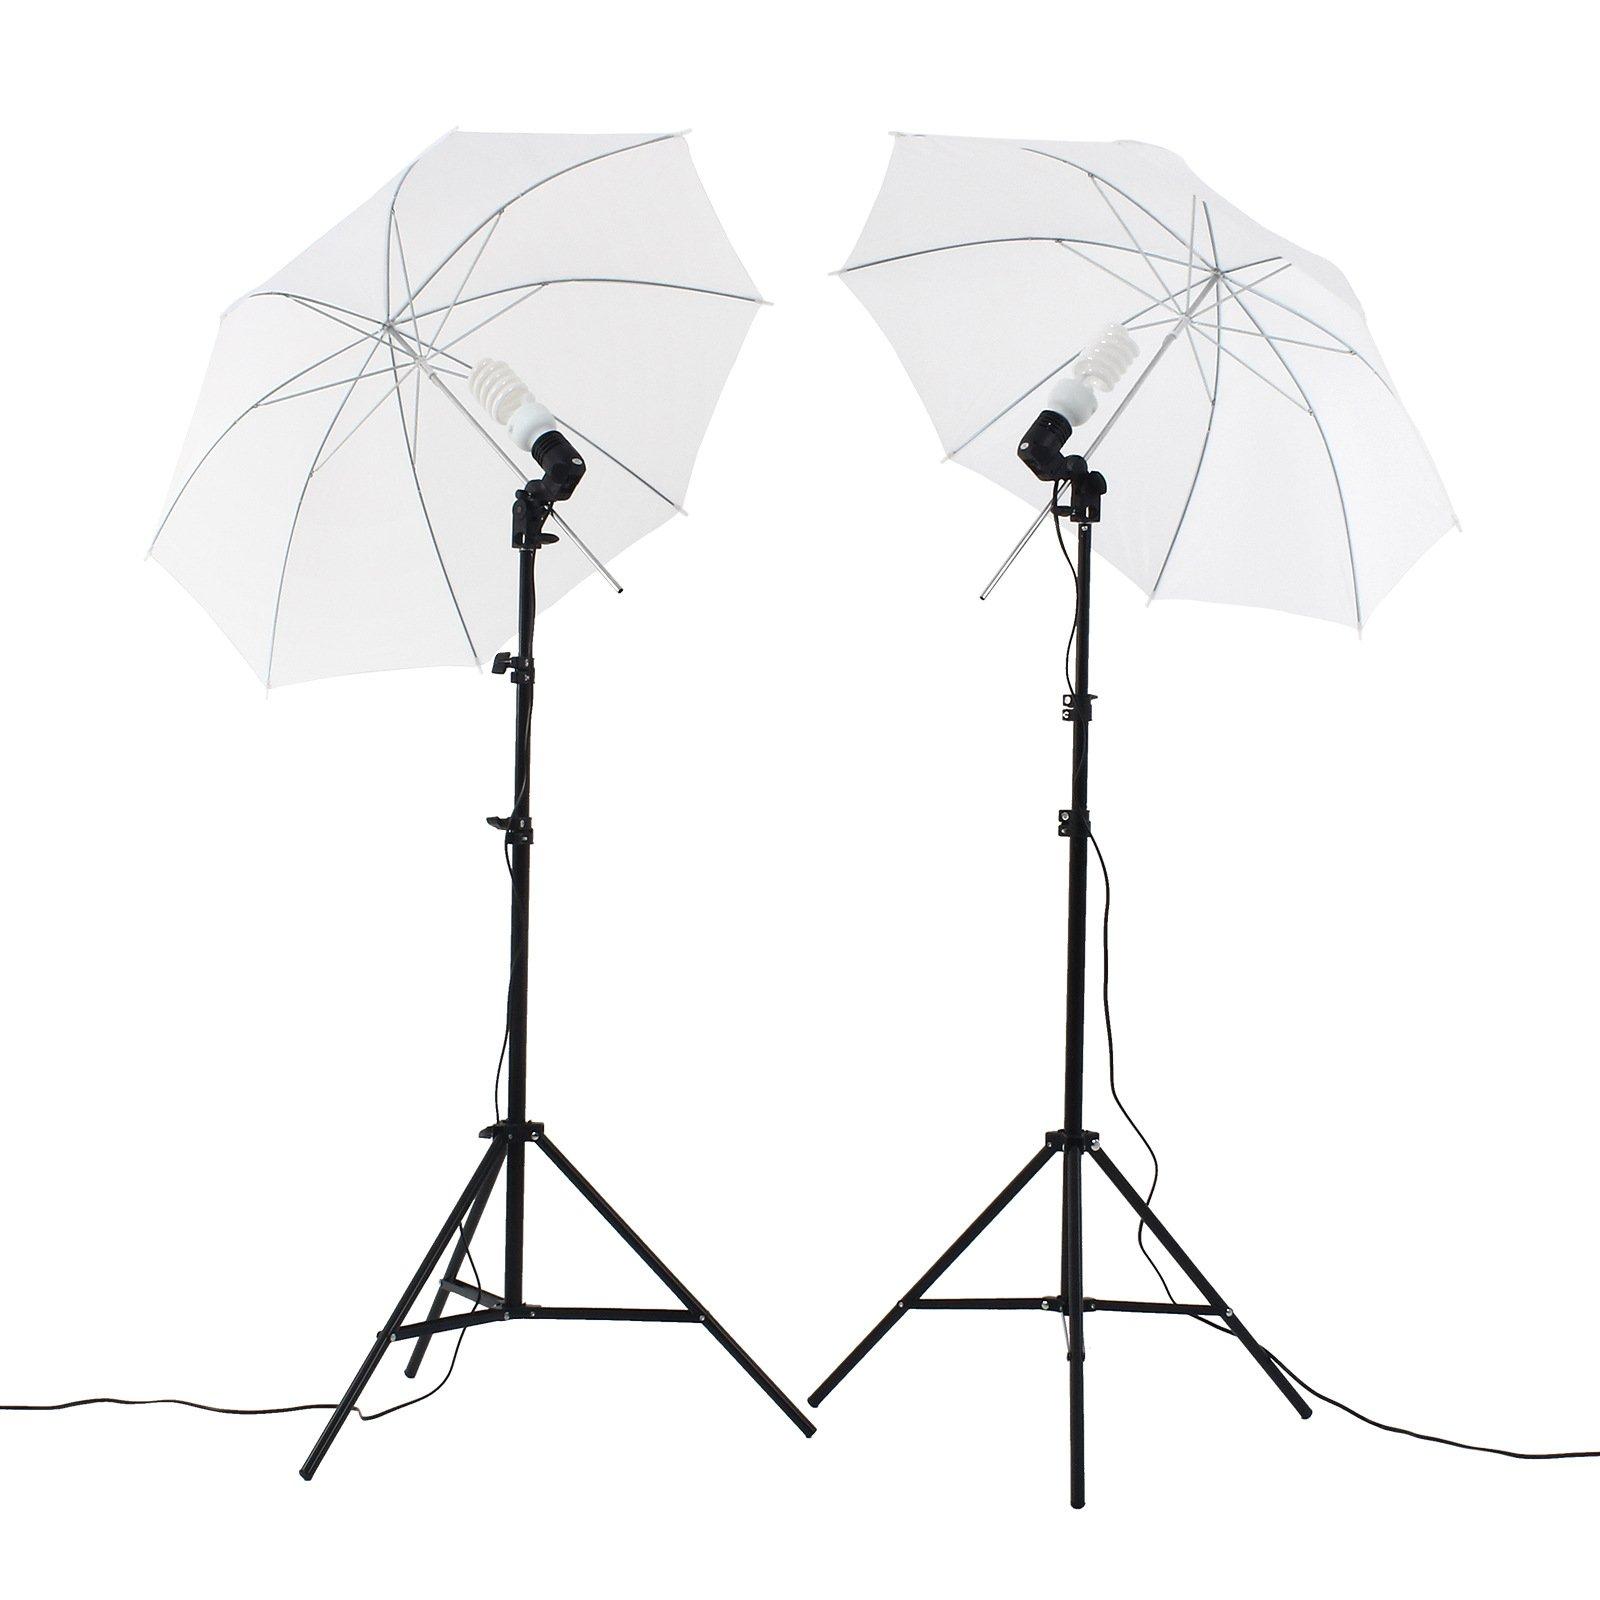 Upland Photography Umbrella Lighting Kit, 33''(83cm)Professional Lighting for Studio Photography, Portrait Lighting and Video Lighting